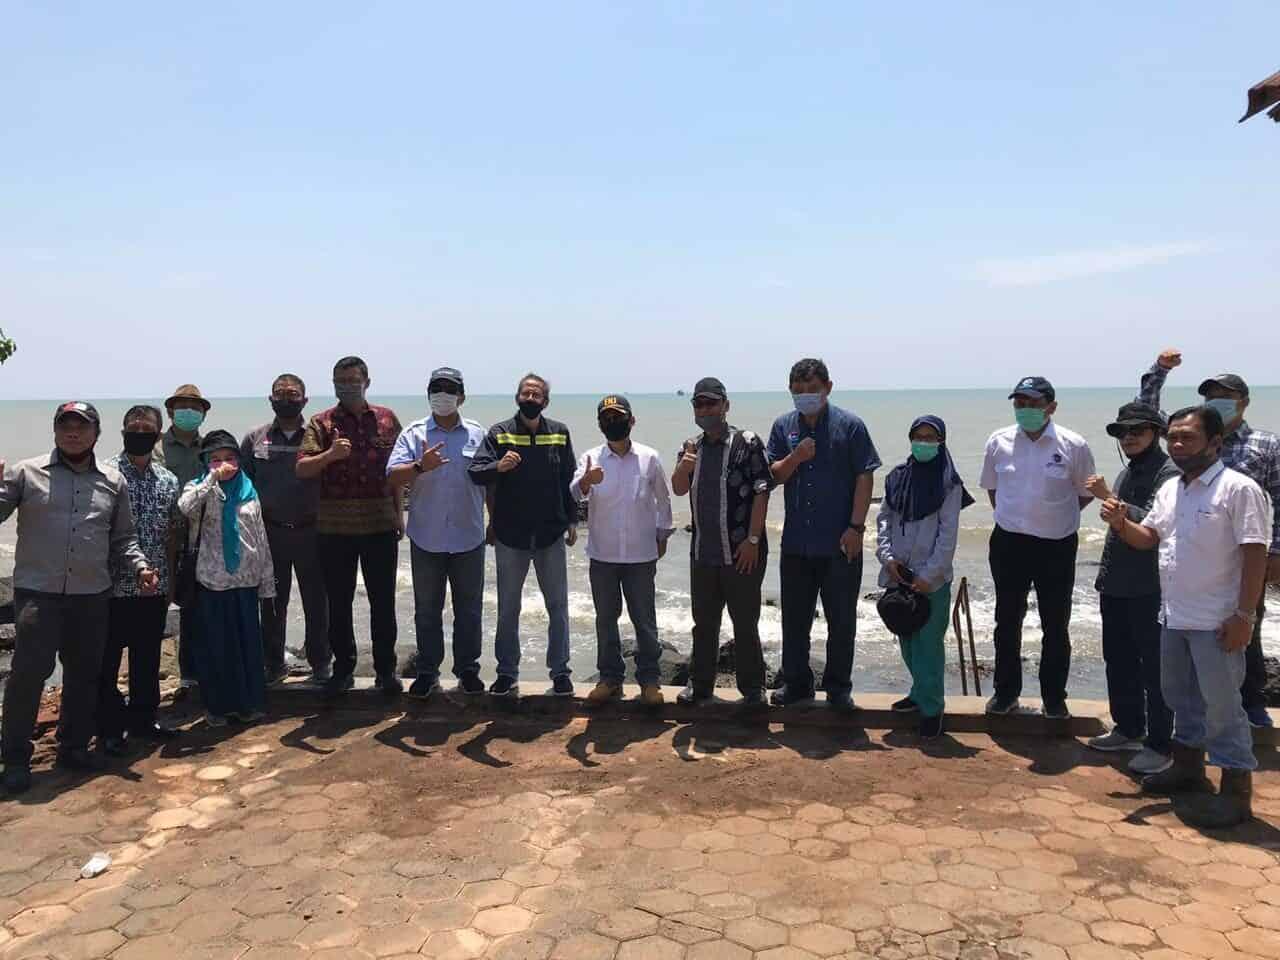 Kemenko Marves Siap Dukung Realisasi Kawasan Industri Terpadu Batang